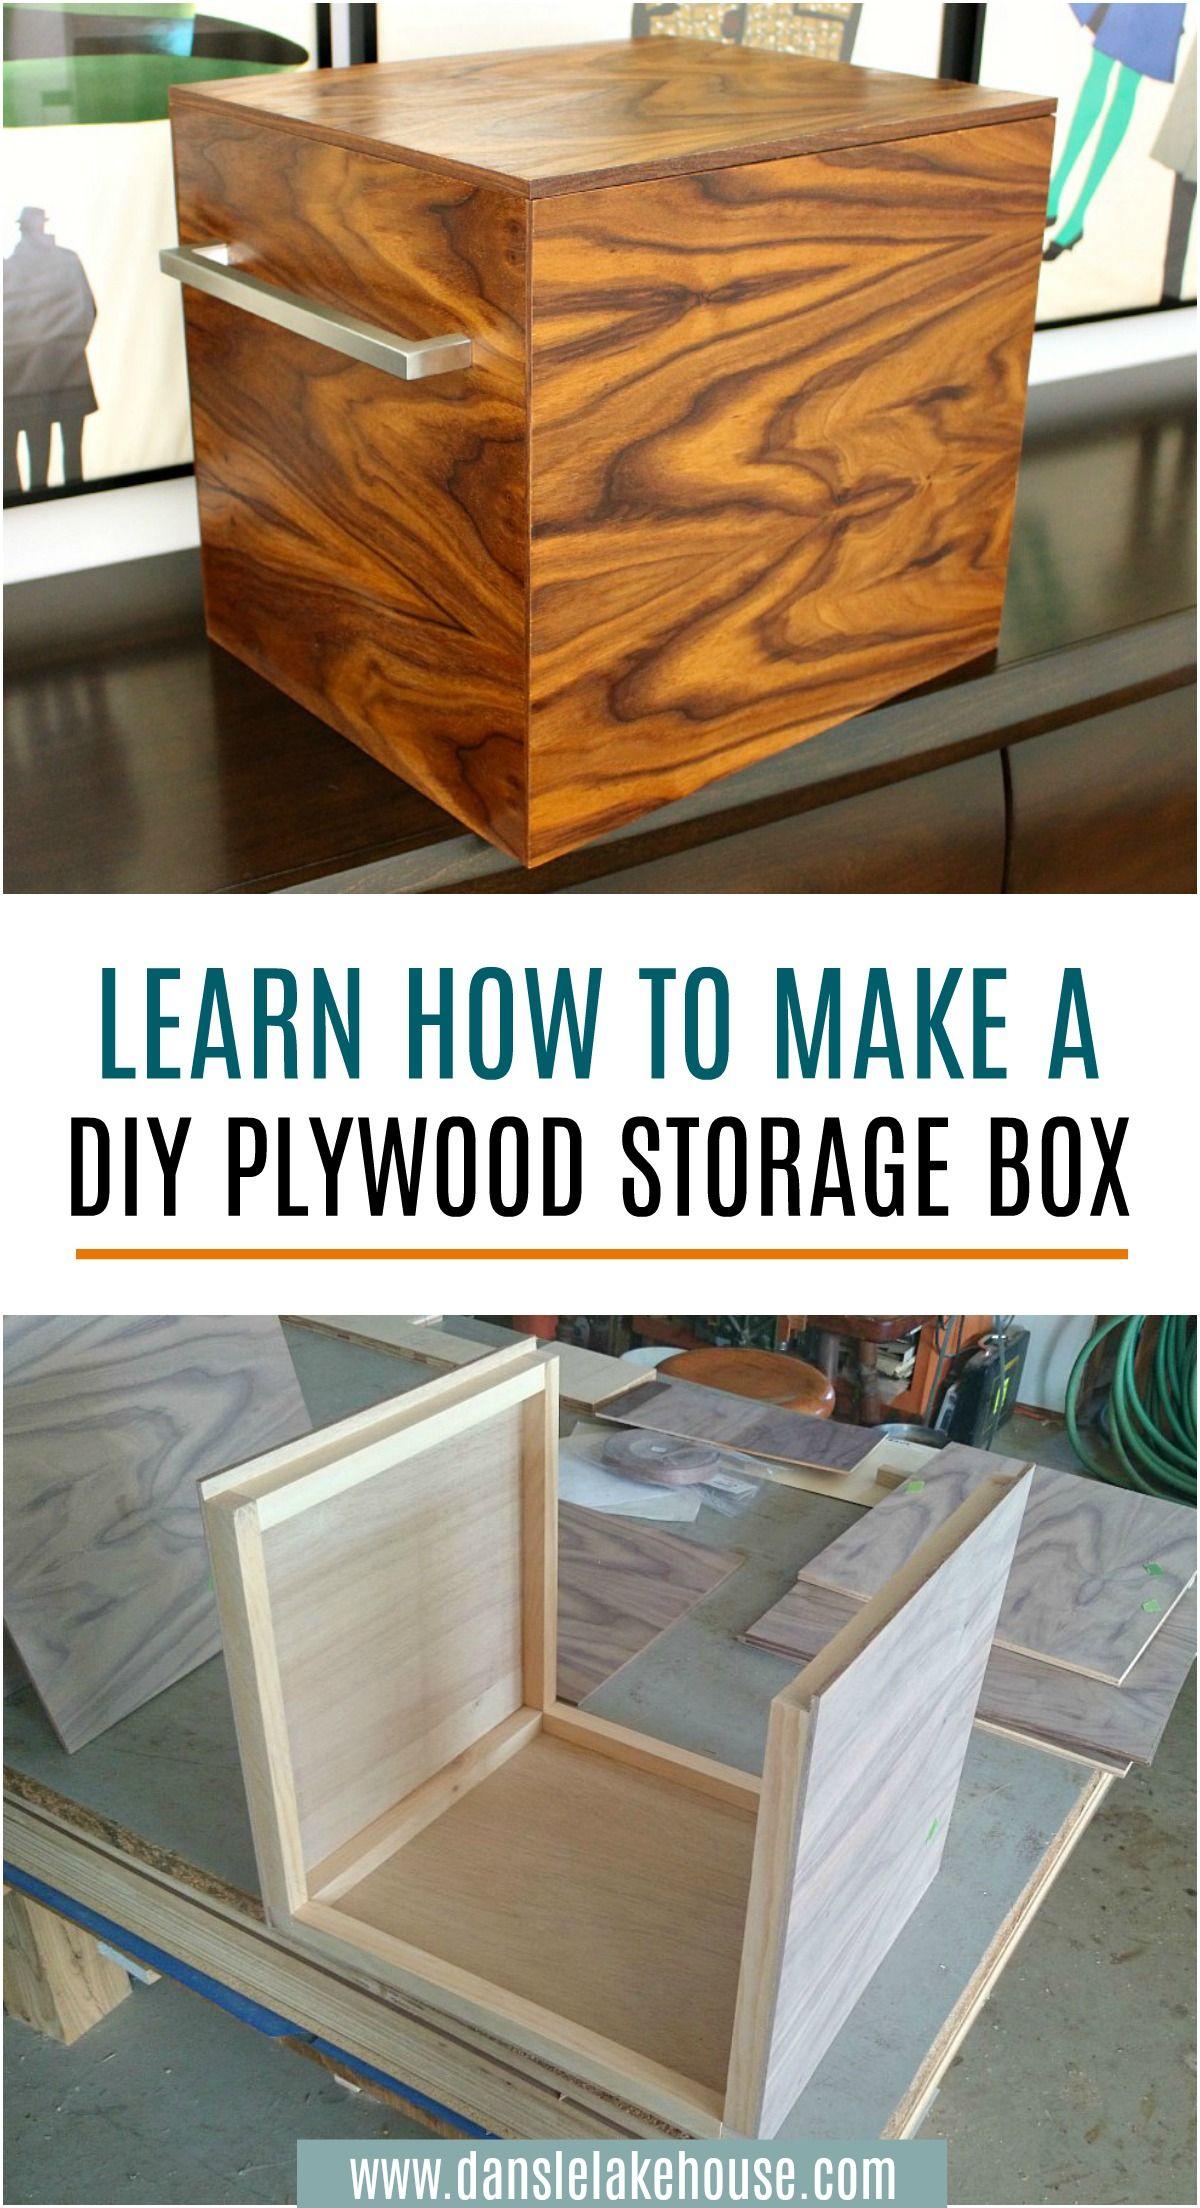 DIY Plywood Storage Bins with a MidCentury Modern Look